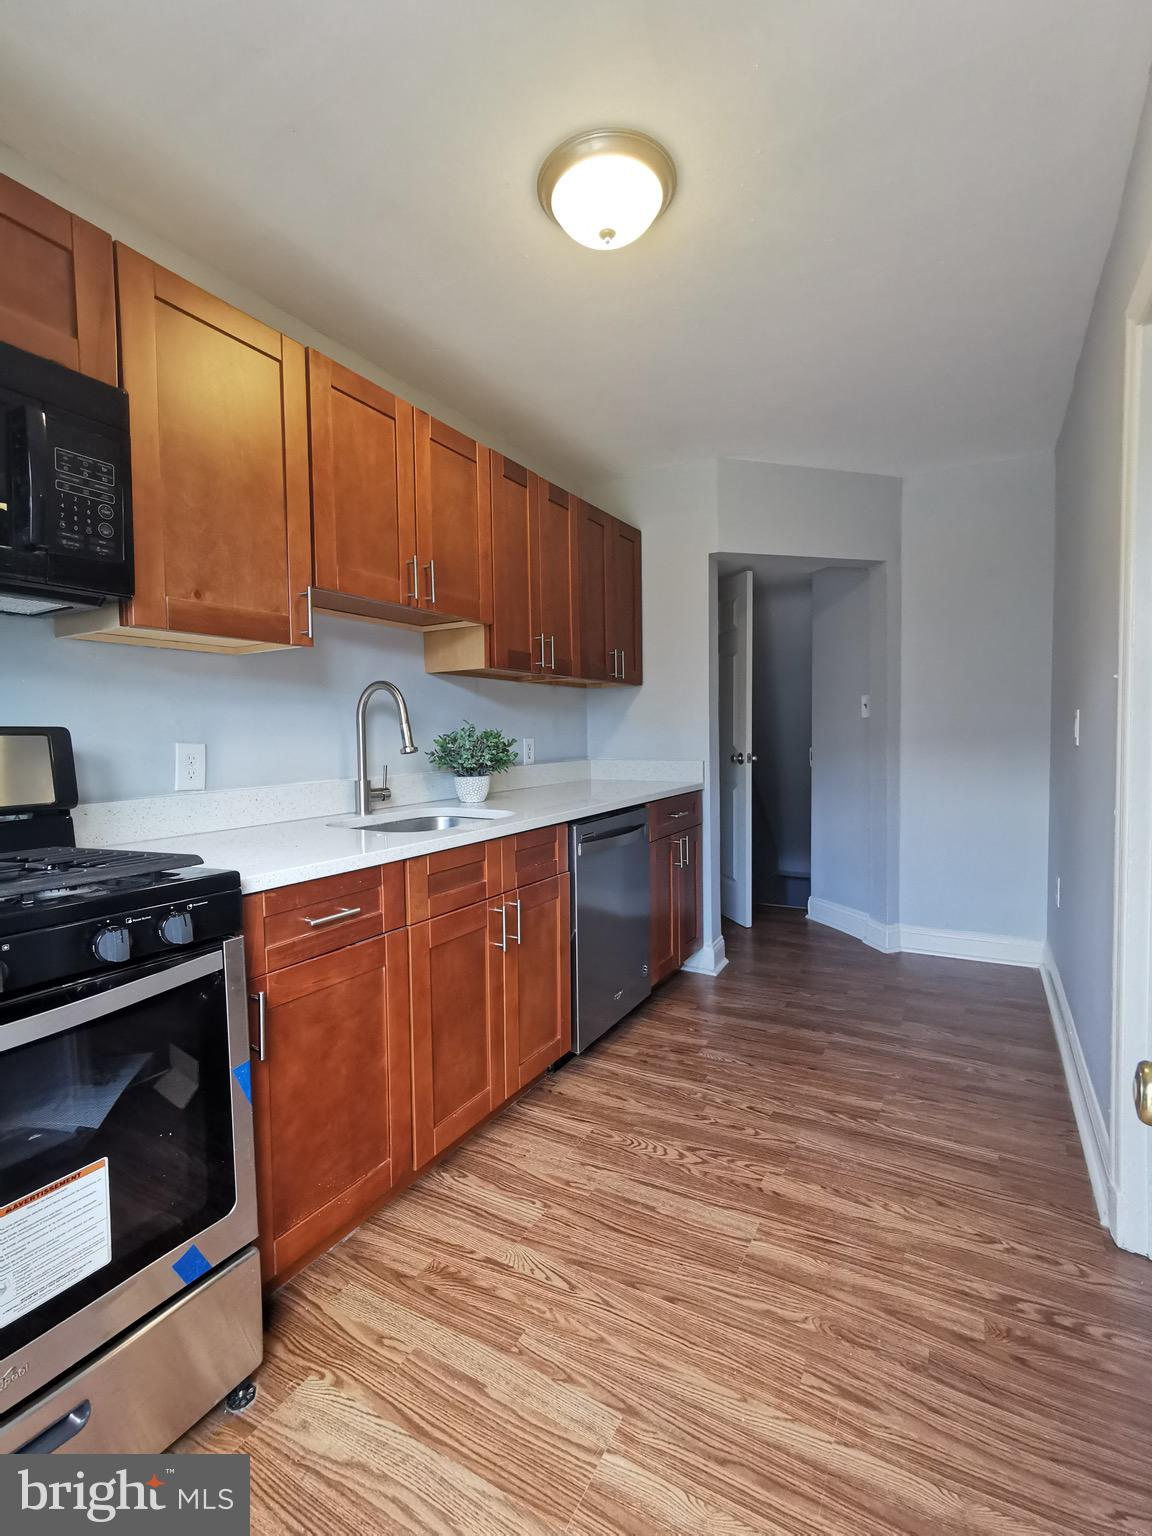 8530 WILLOW OAK ROAD, Parkville, Maryland 21234, 3 Bedrooms Bedrooms, ,2 BathroomsBathrooms,Townhouse,For Sale,8530 WILLOW OAK ROAD,MDBC525254